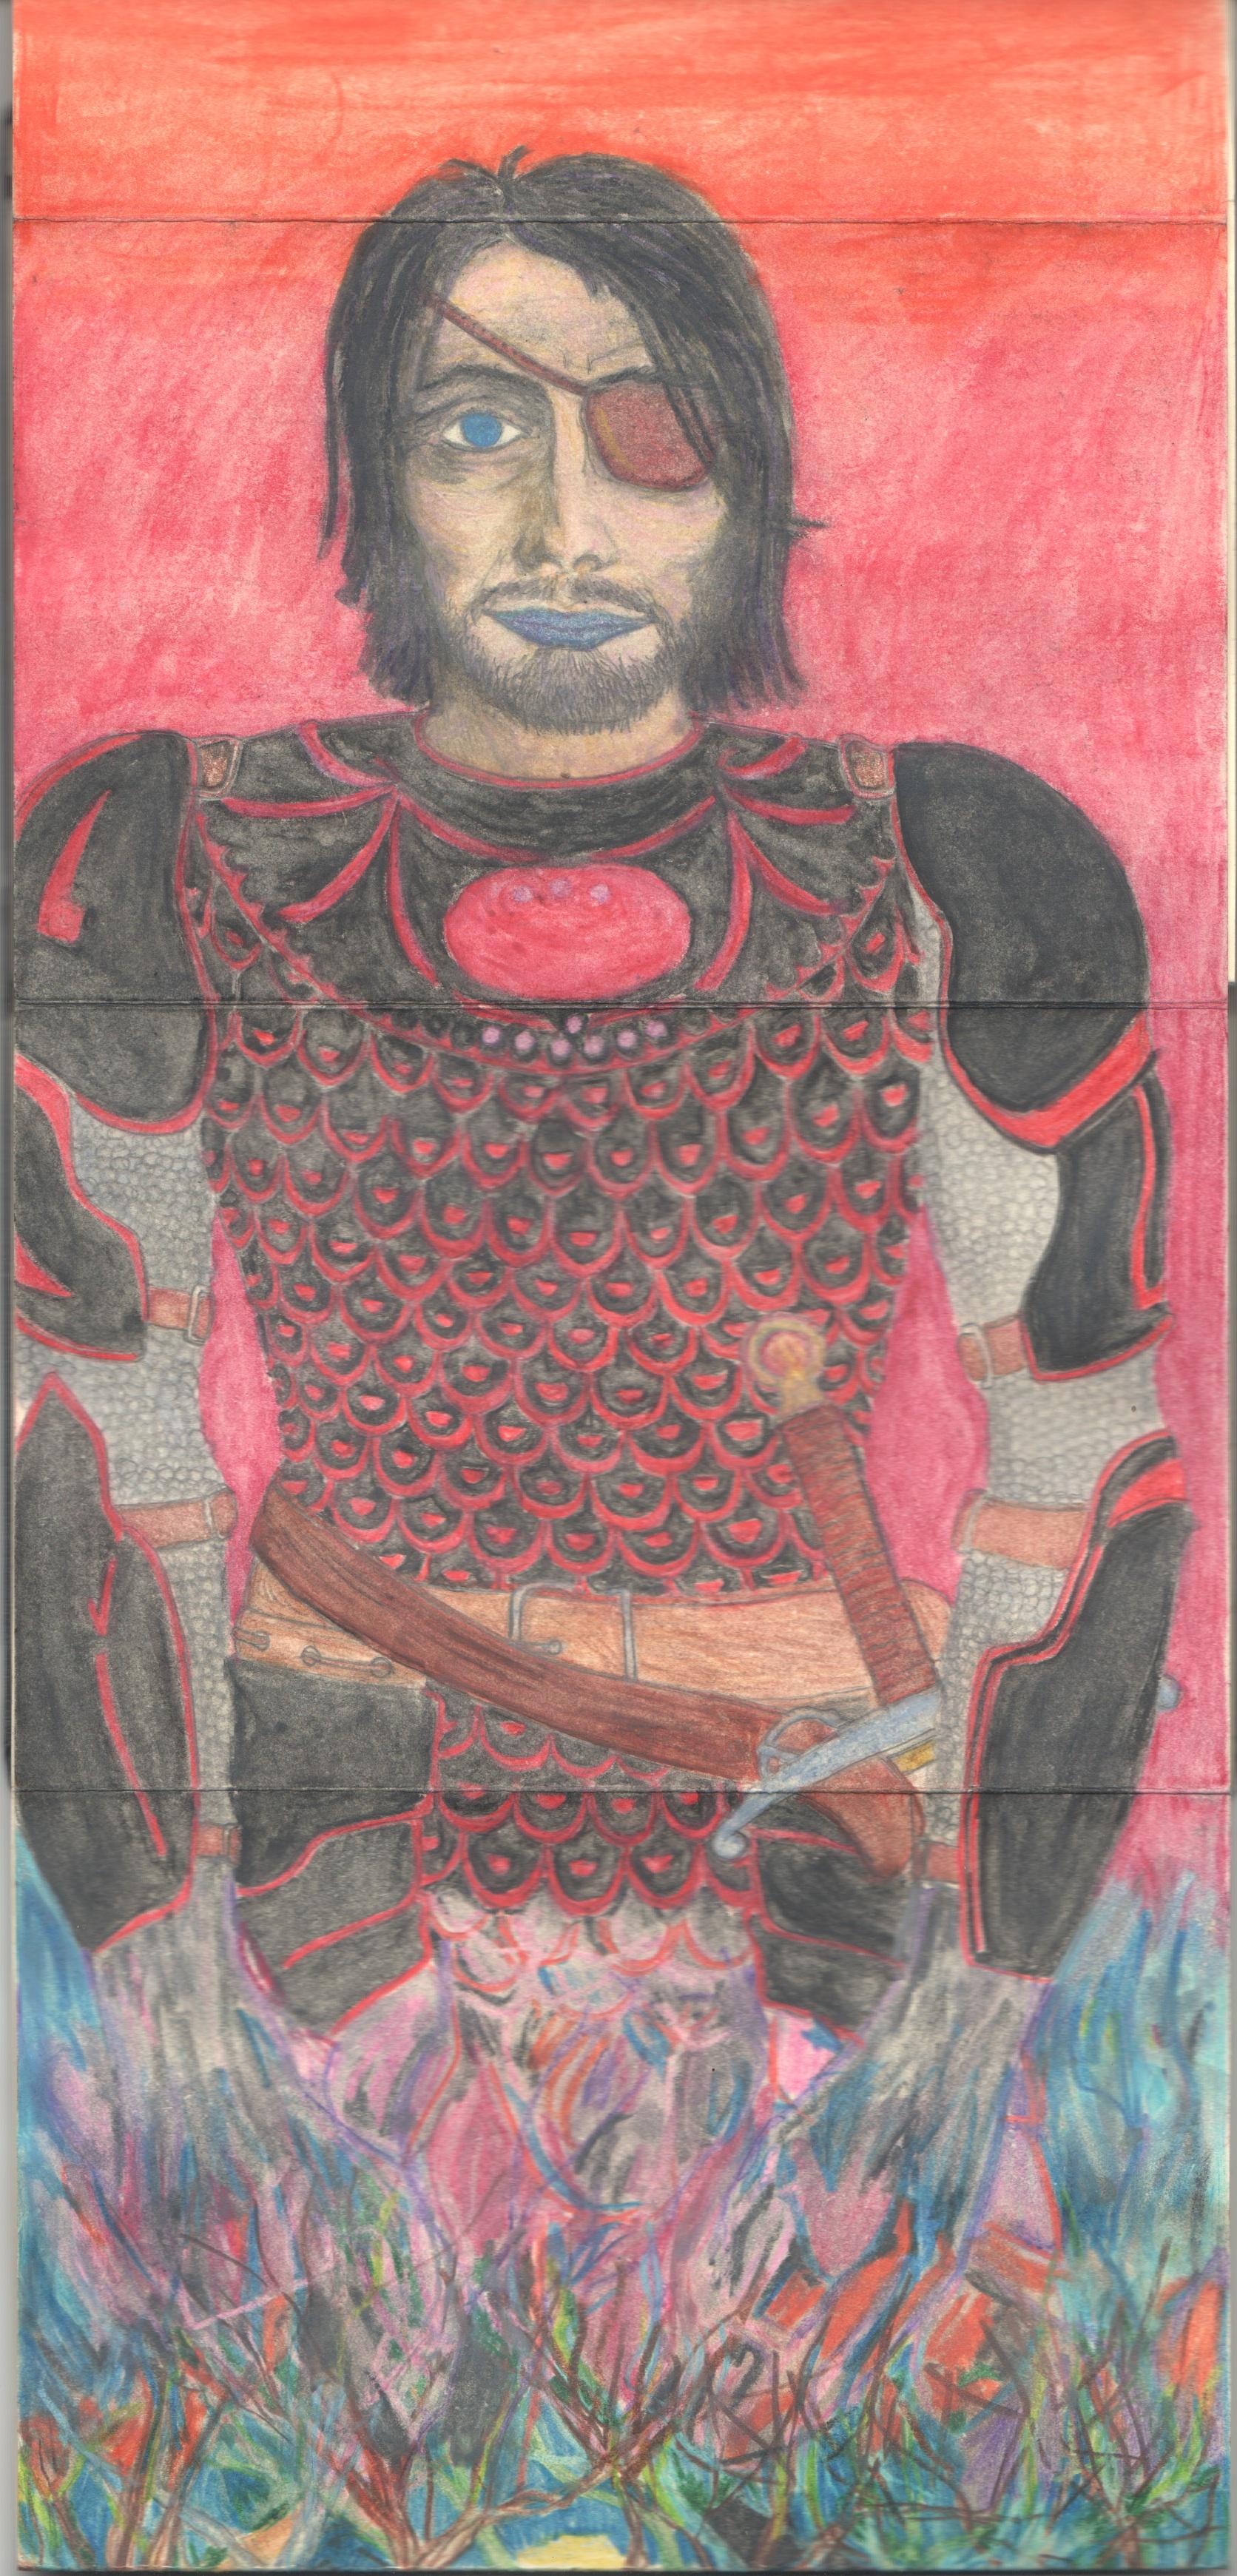 Euron Greyjoy valyrian steel armor